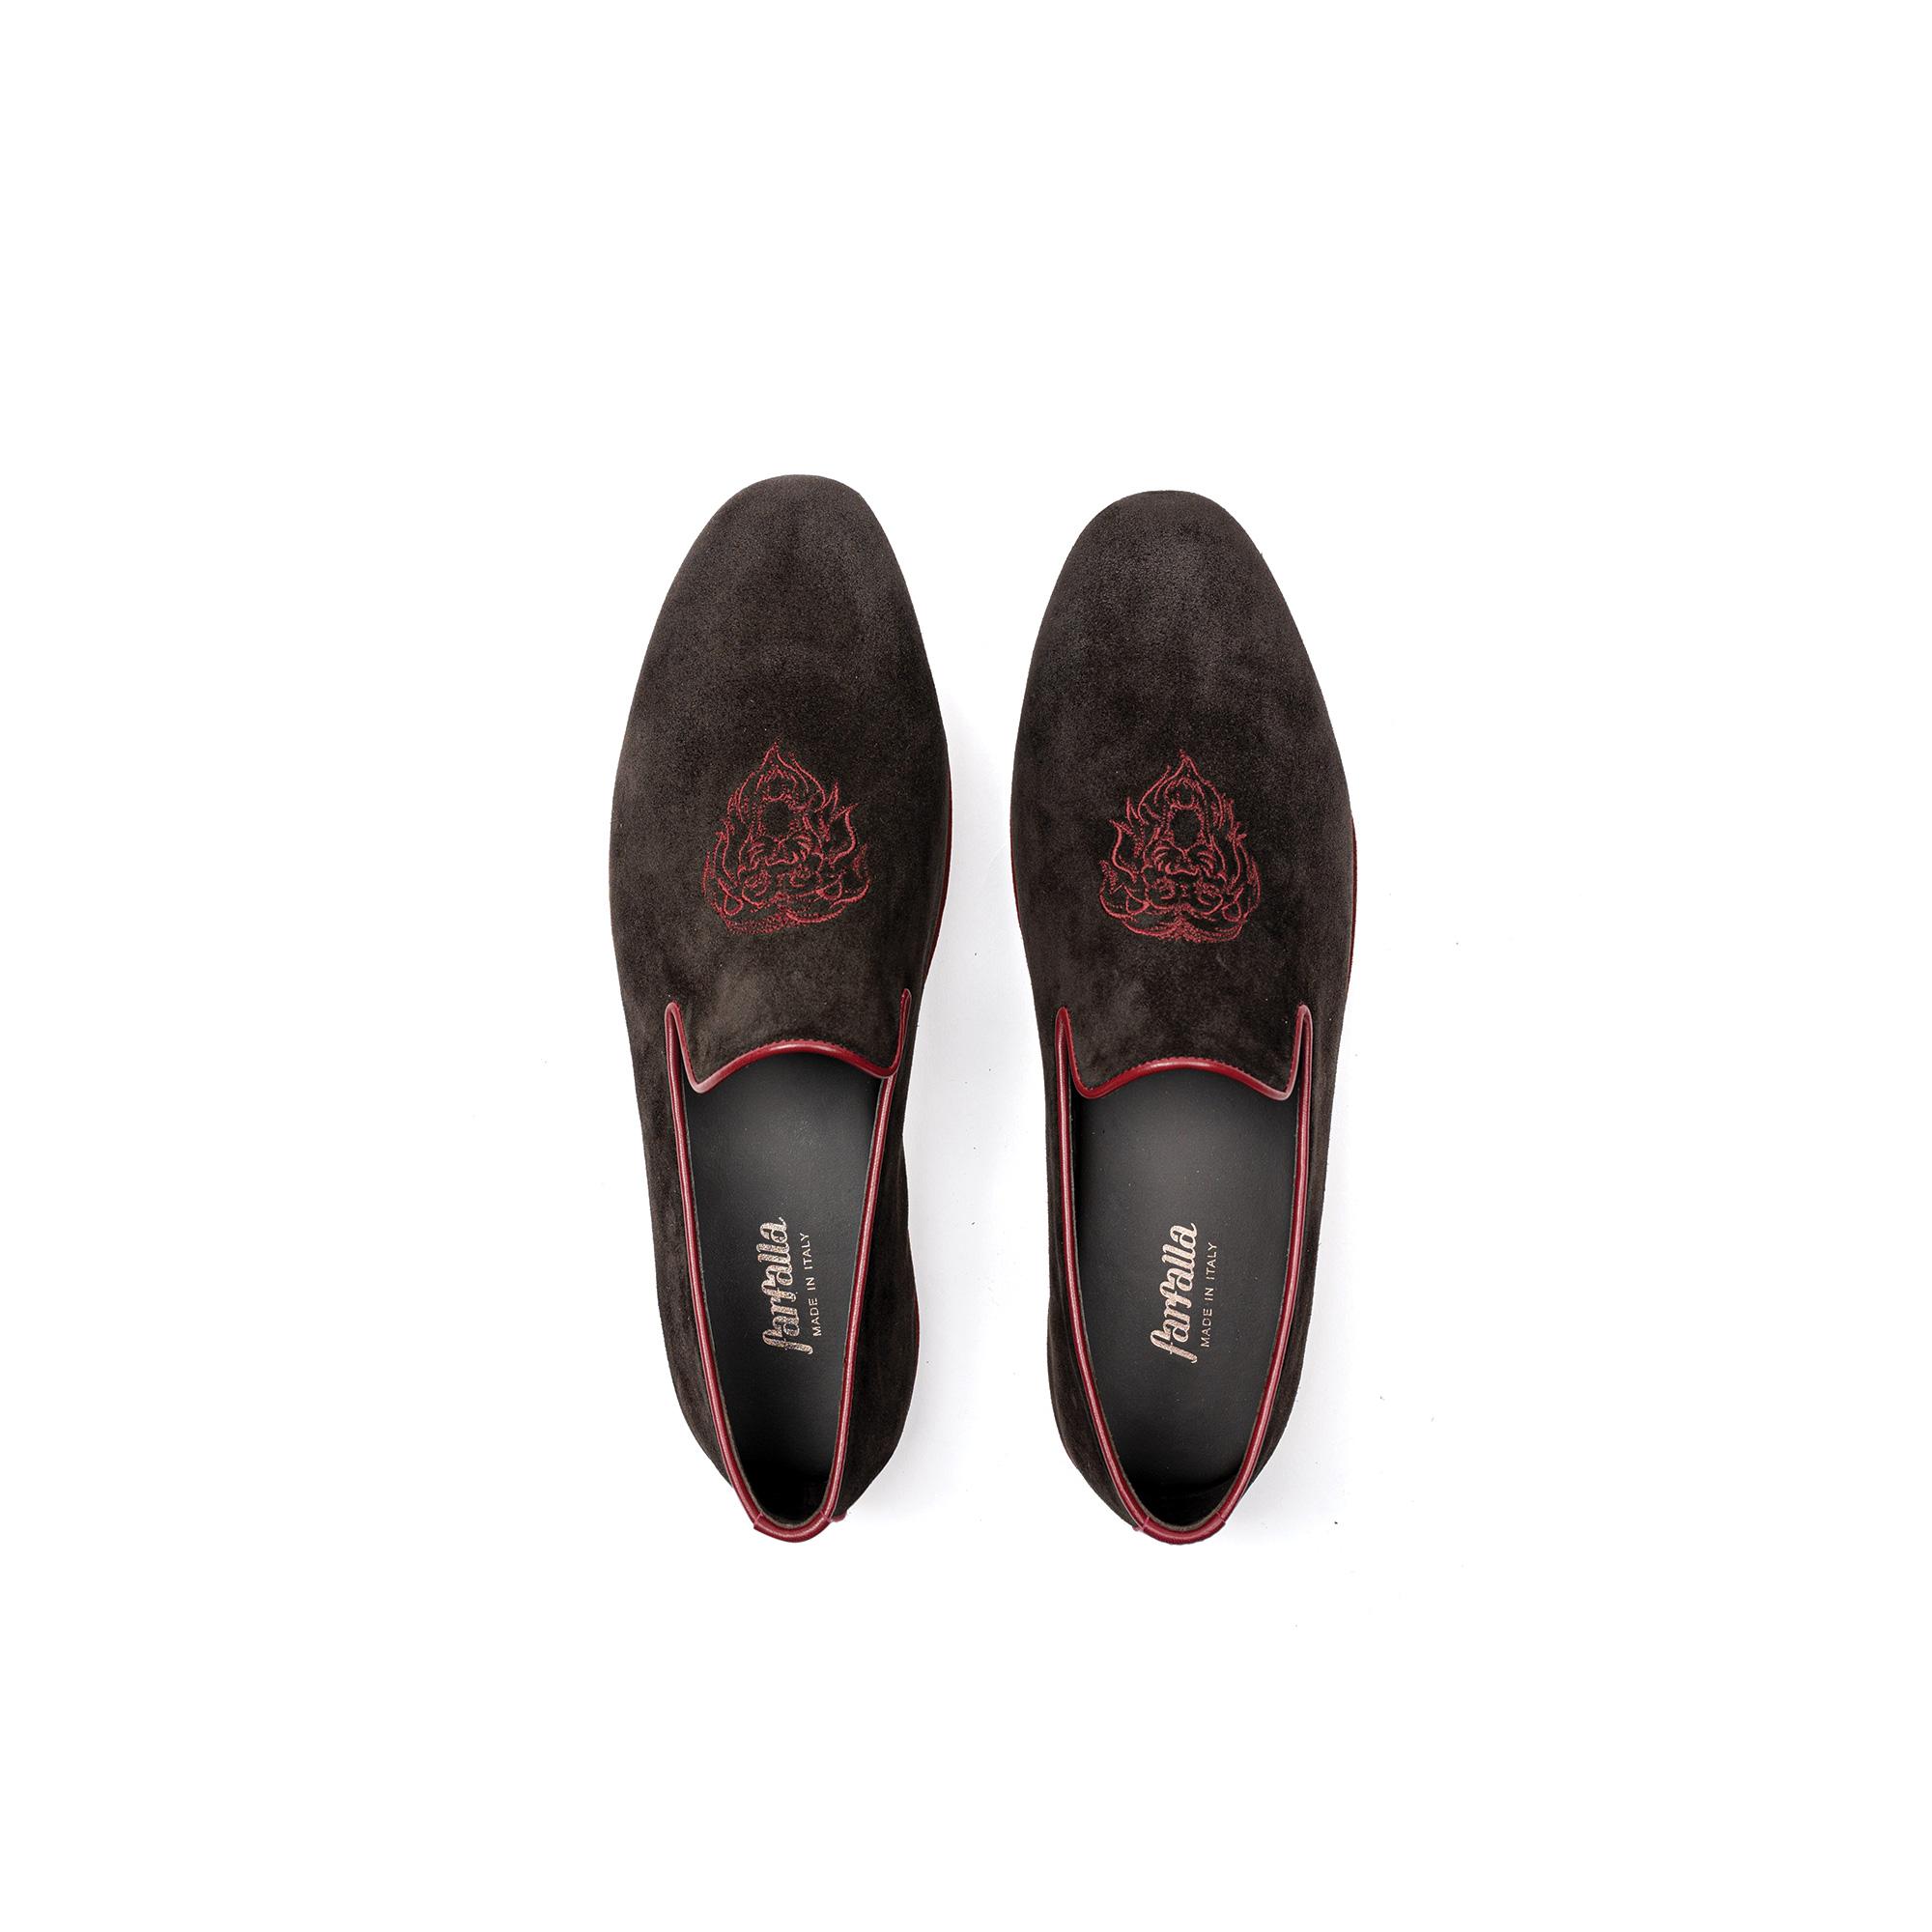 Indoor classic slipper in brown velour - Farfalla italian slippers